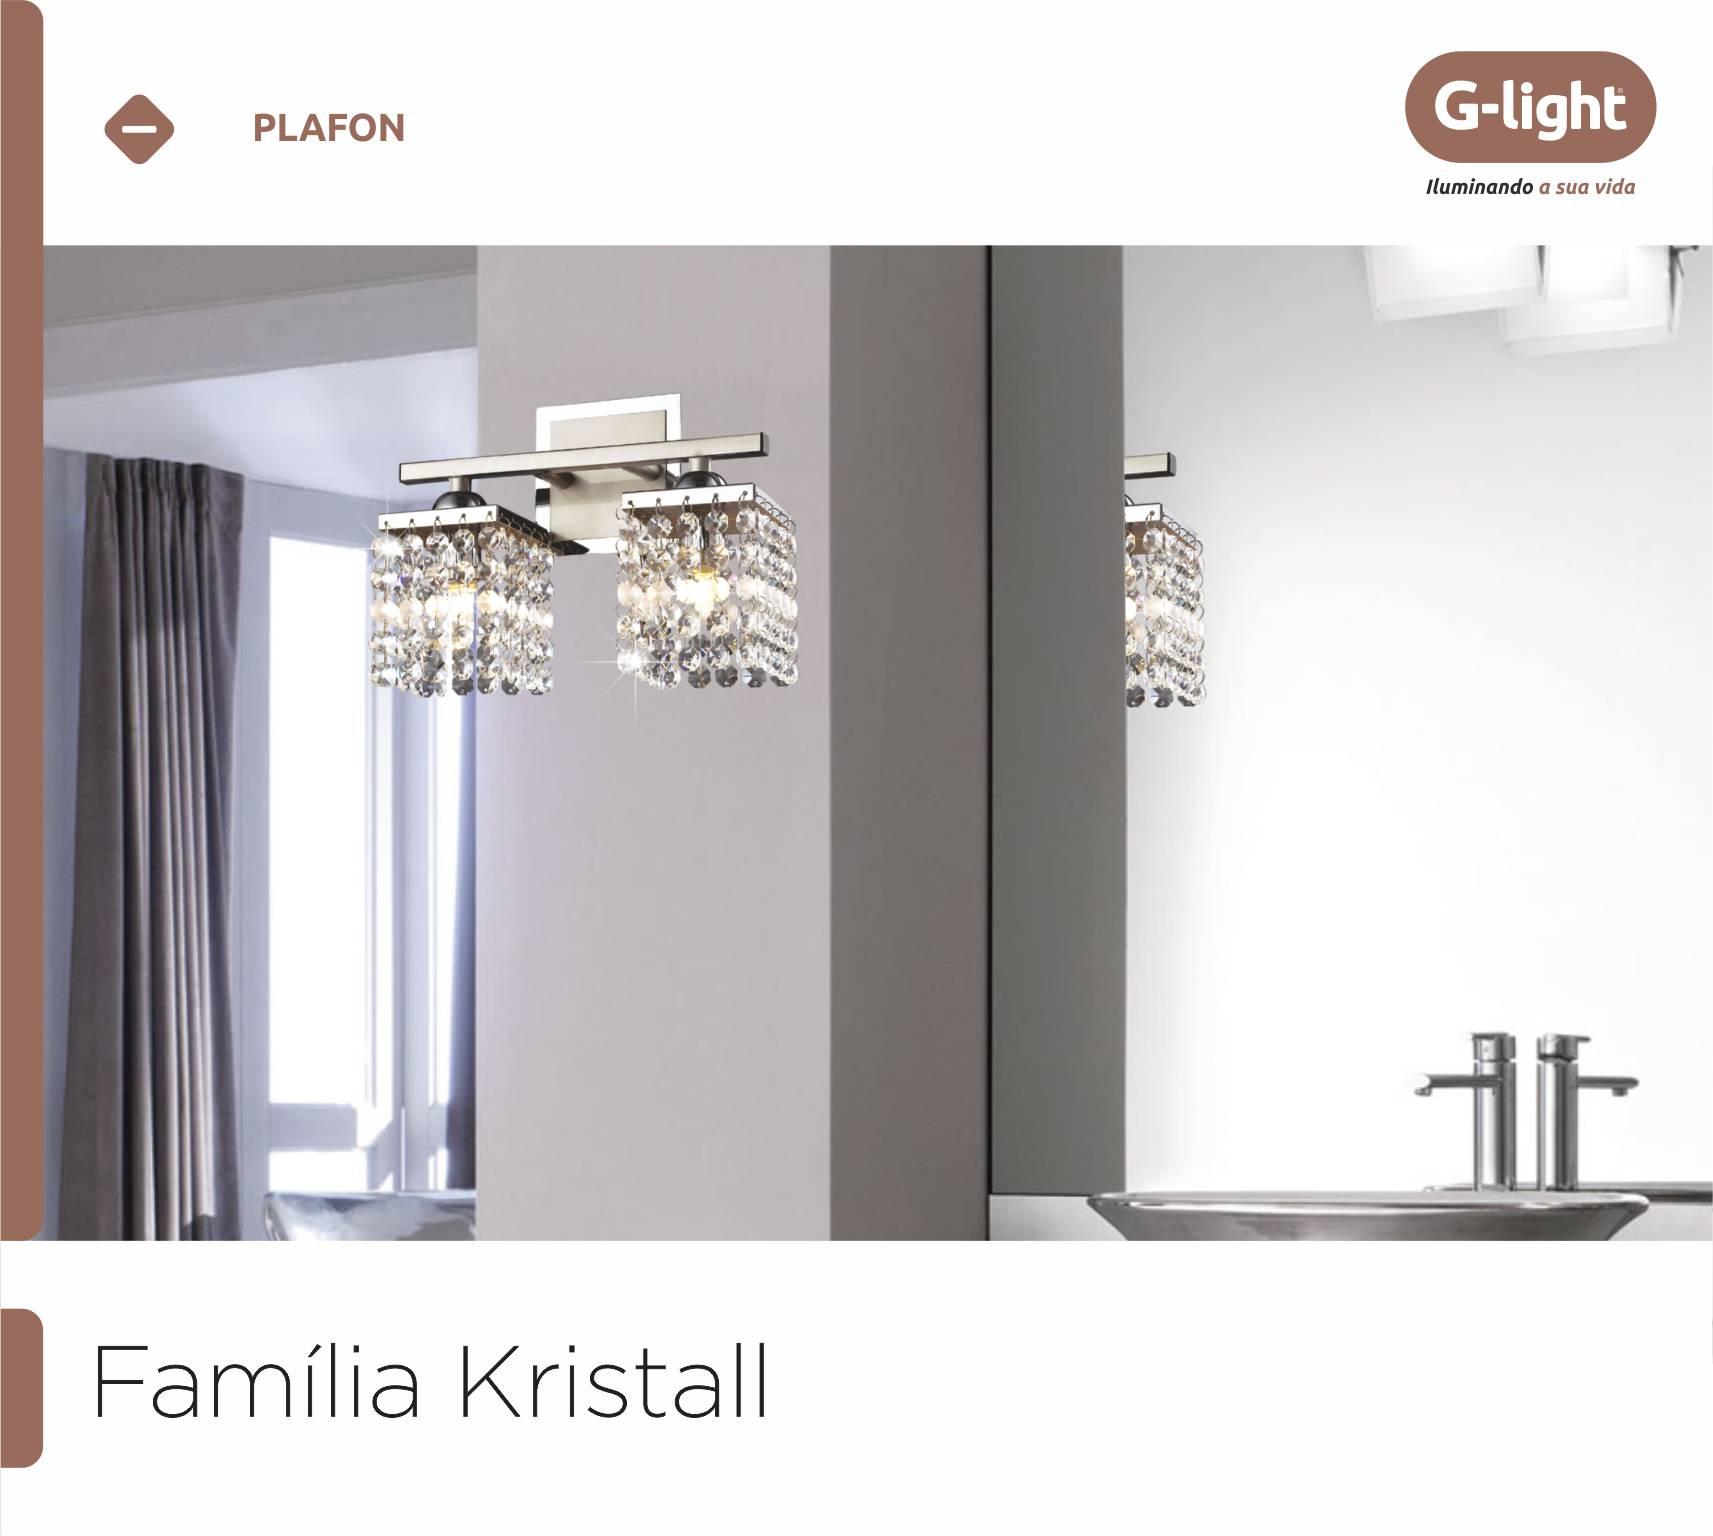 Família Kristall